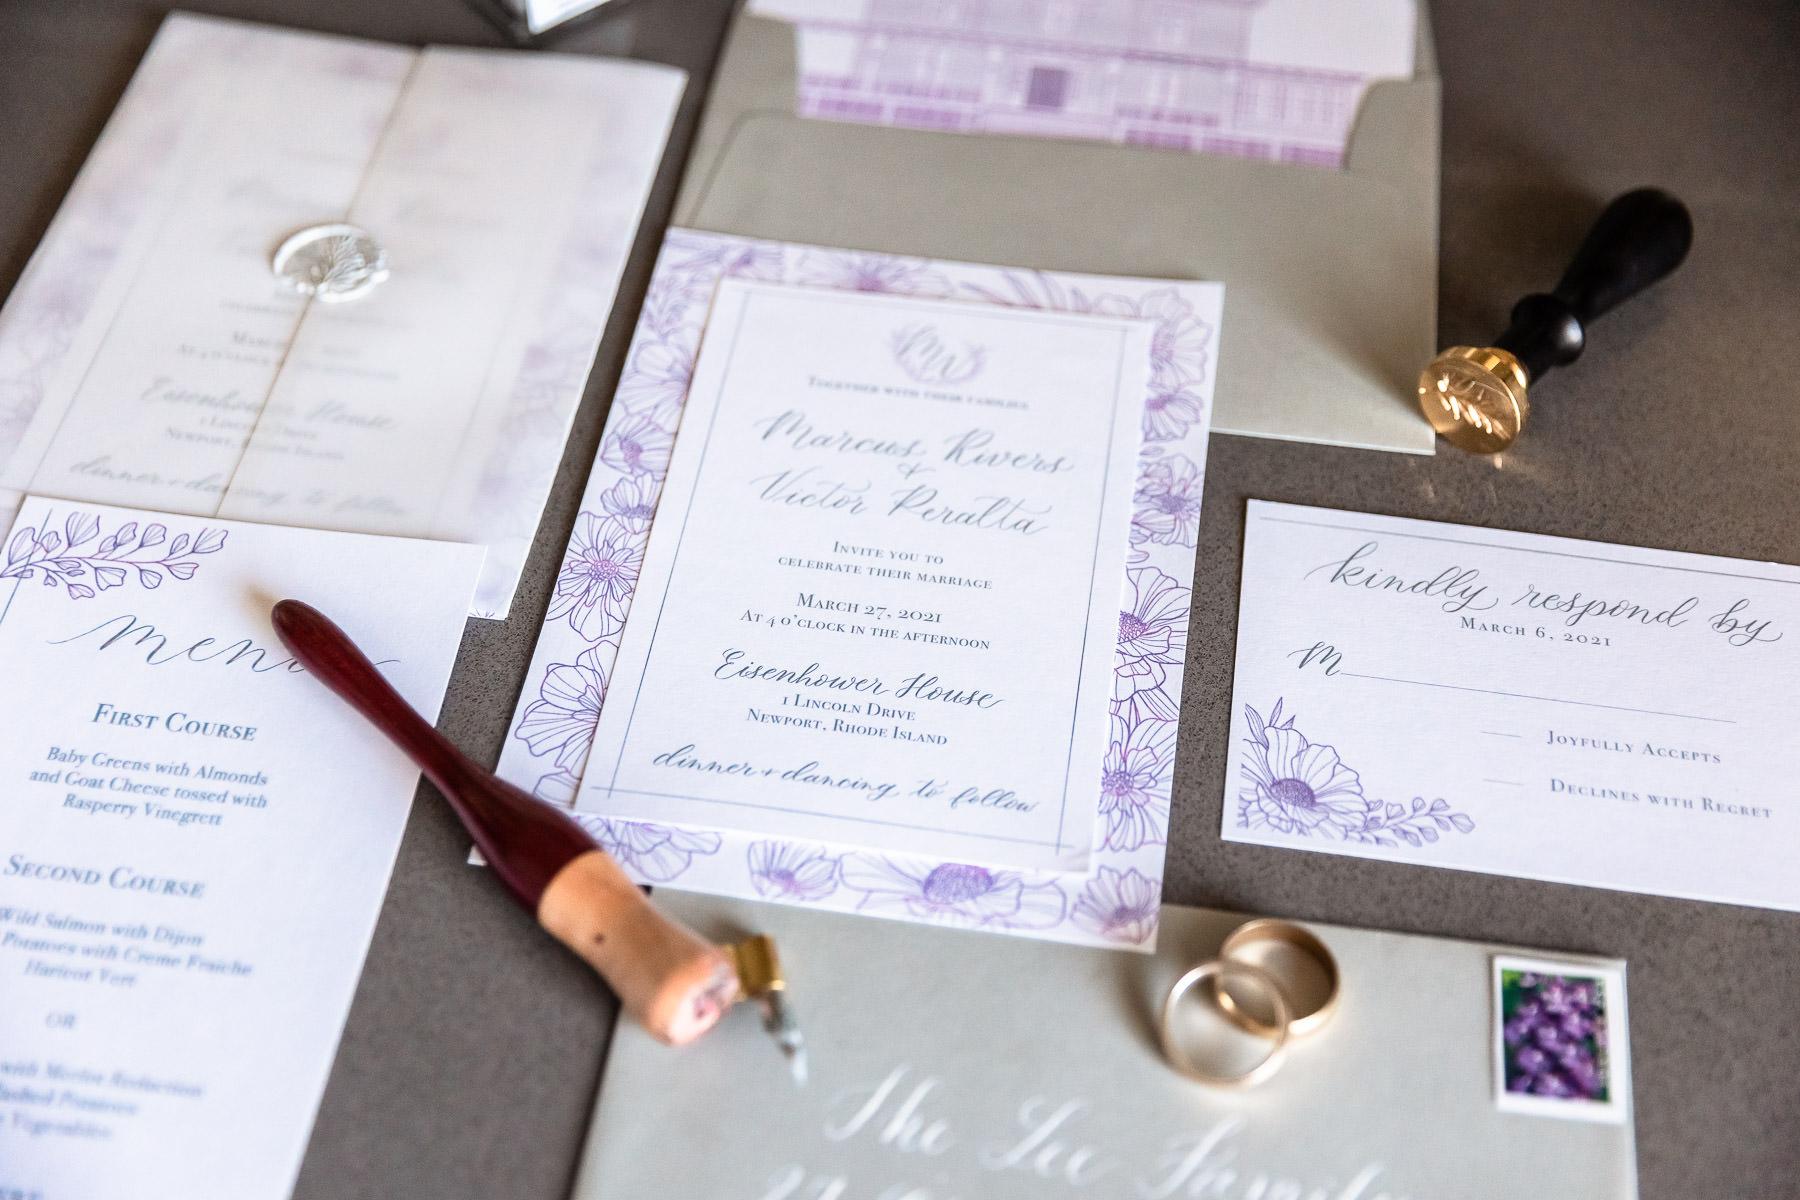 Eisenhower House, Newport, Rhode Island, Tracy Jenkins Photography, wedding, LGBTQ+, LGBT, Gay, Inclusive, Photography, Wedding photography, invitation suite, lavender, grey